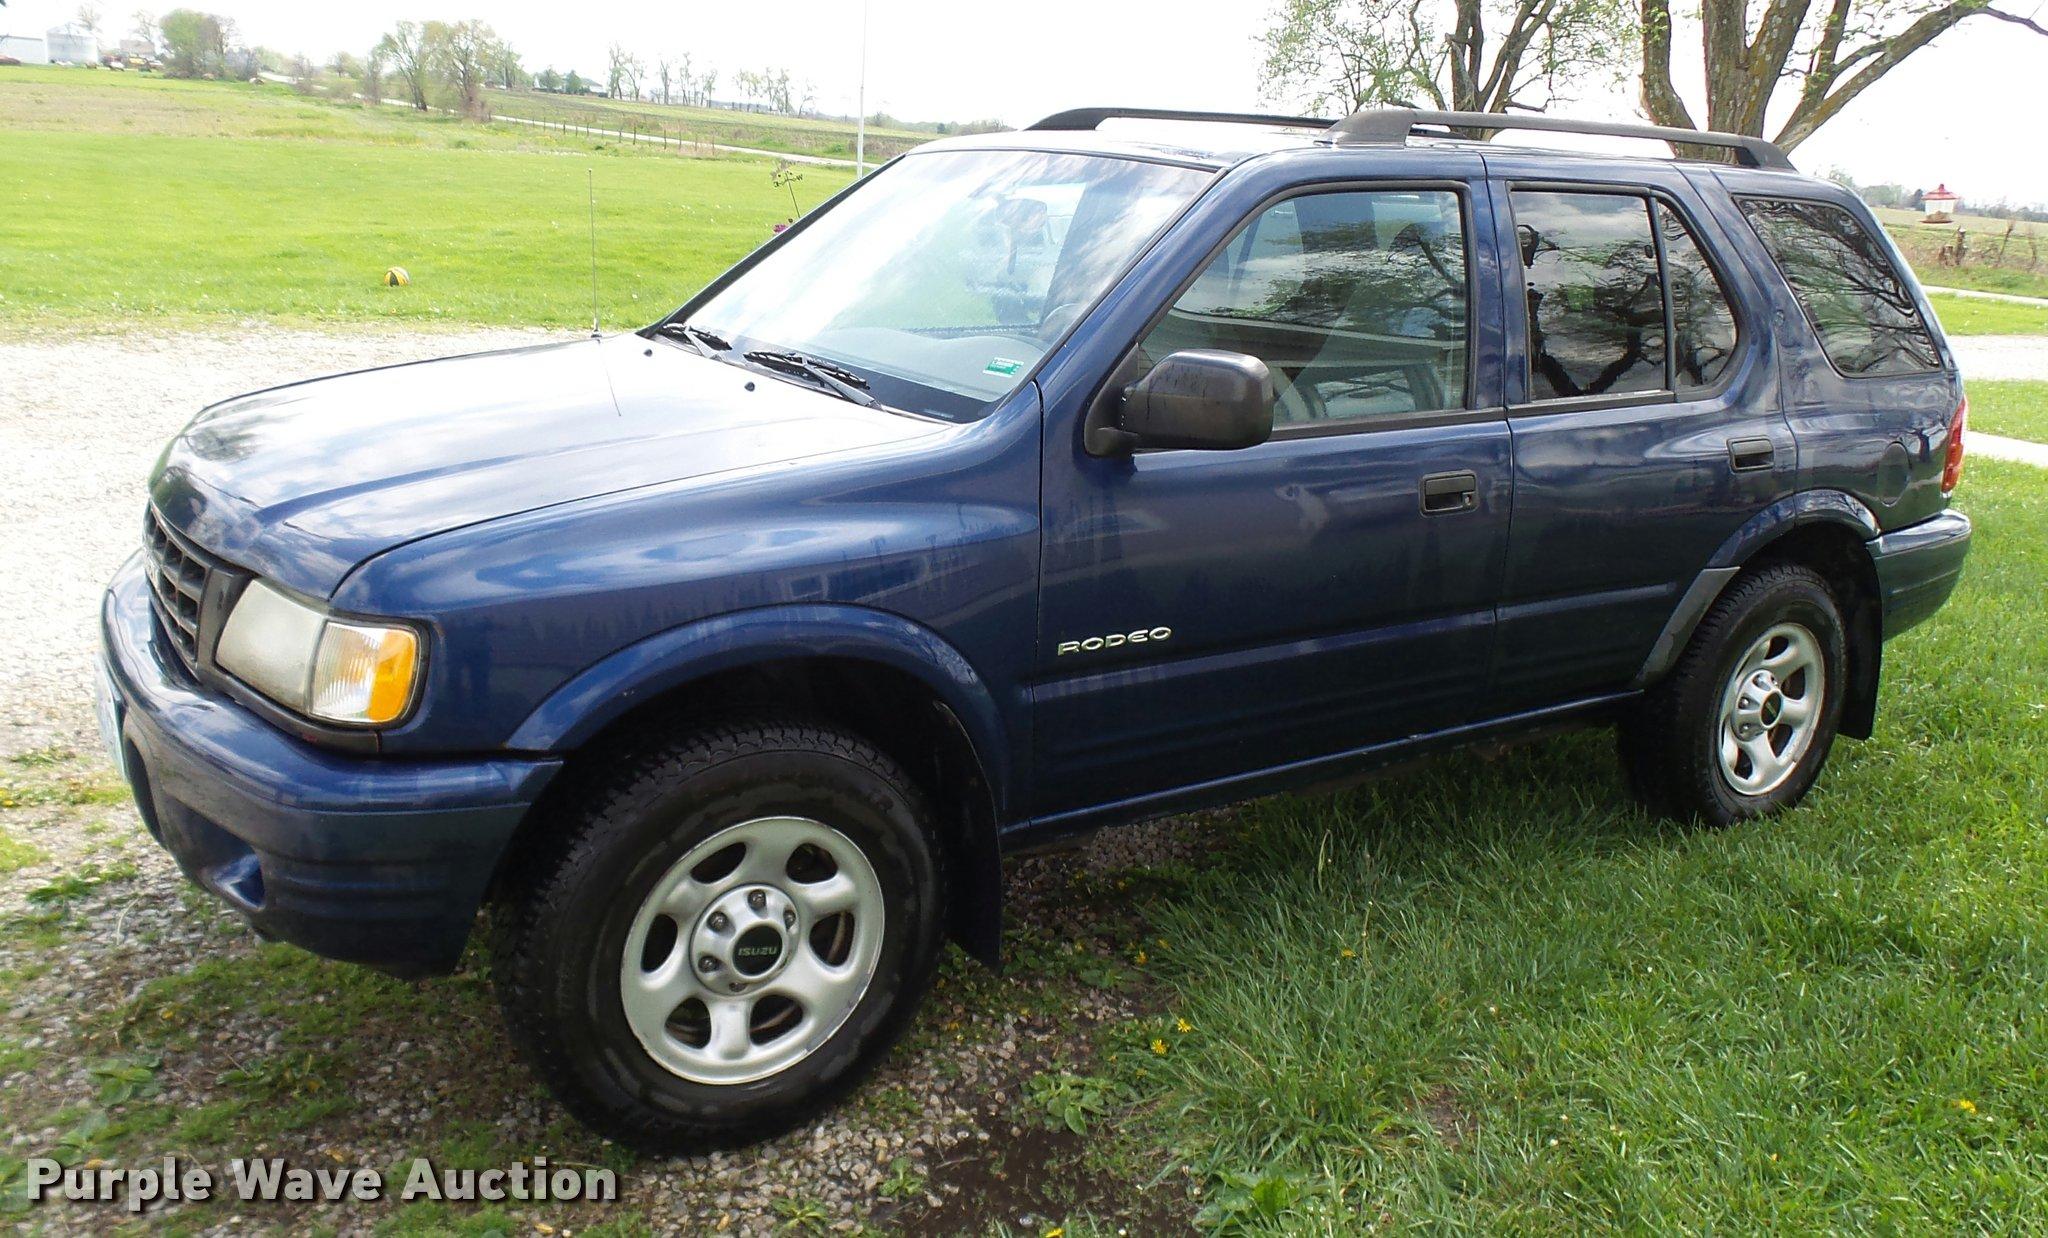 2004 isuzu rodeo suv item ca9003 sold may 10 vehicles a